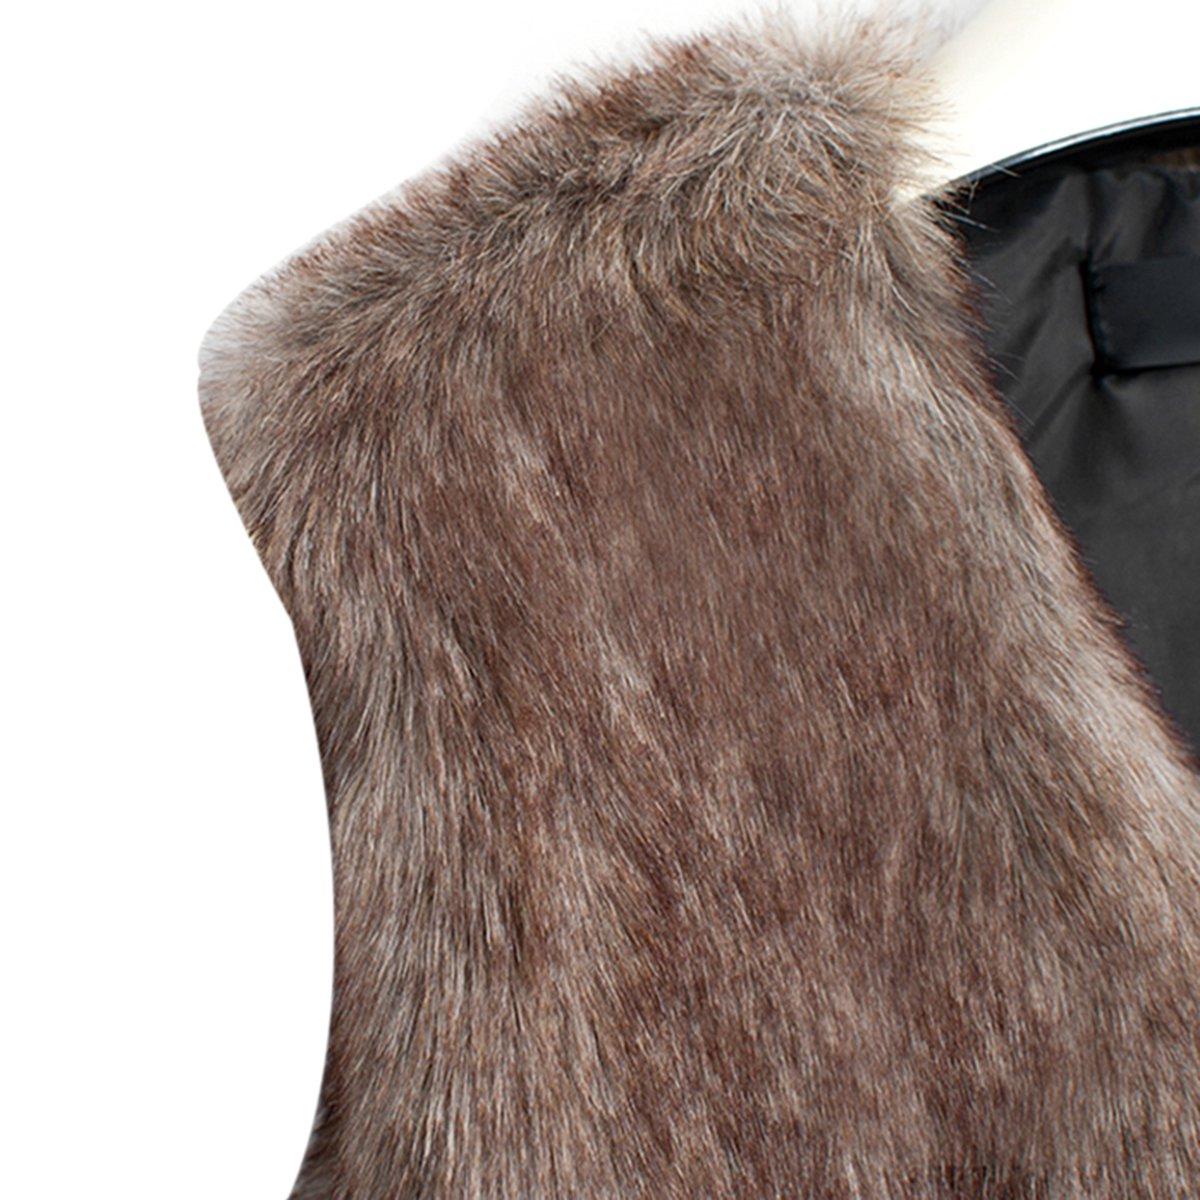 FUNOC Kids Baby Girls Faux Fur WaistCoat Fashion Short Vest Jacket Coat by FUNOC (Image #2)